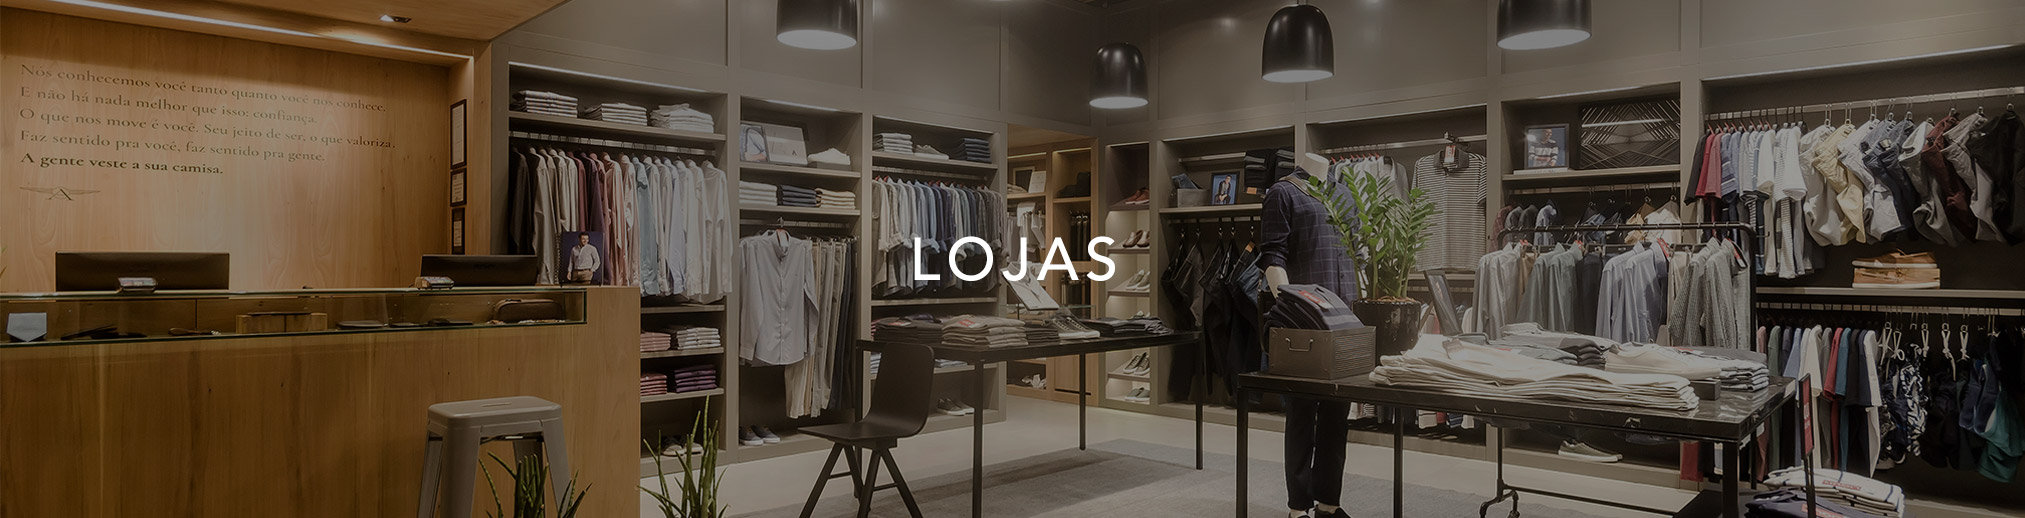 FullBanner Lojas